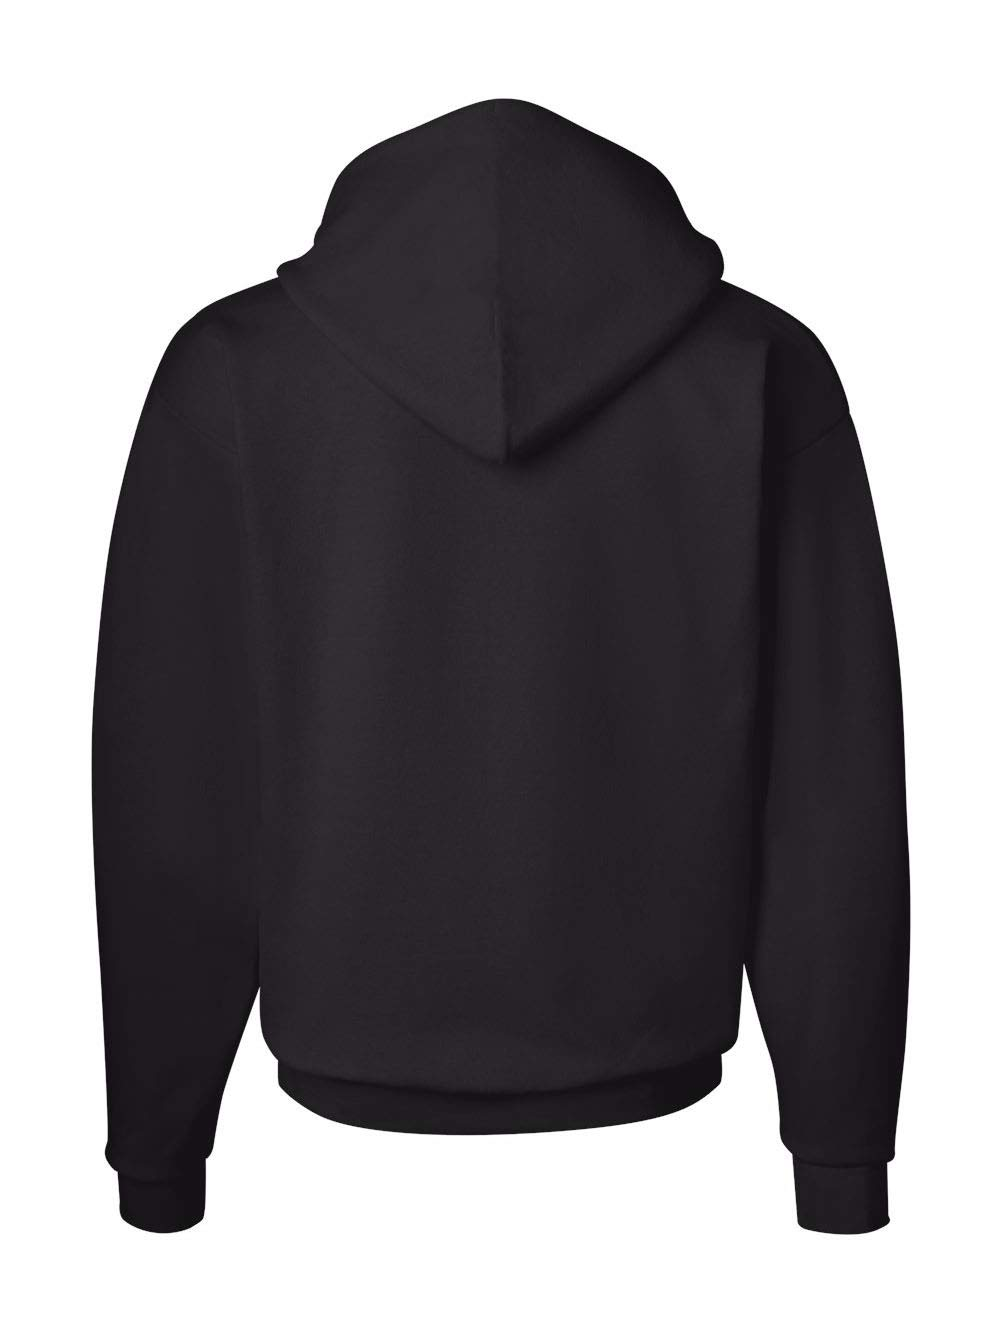 Hanes Men's Pullover EcoSmart Fleece Hoodie, Black, X-Large by Hanes (Image #4)